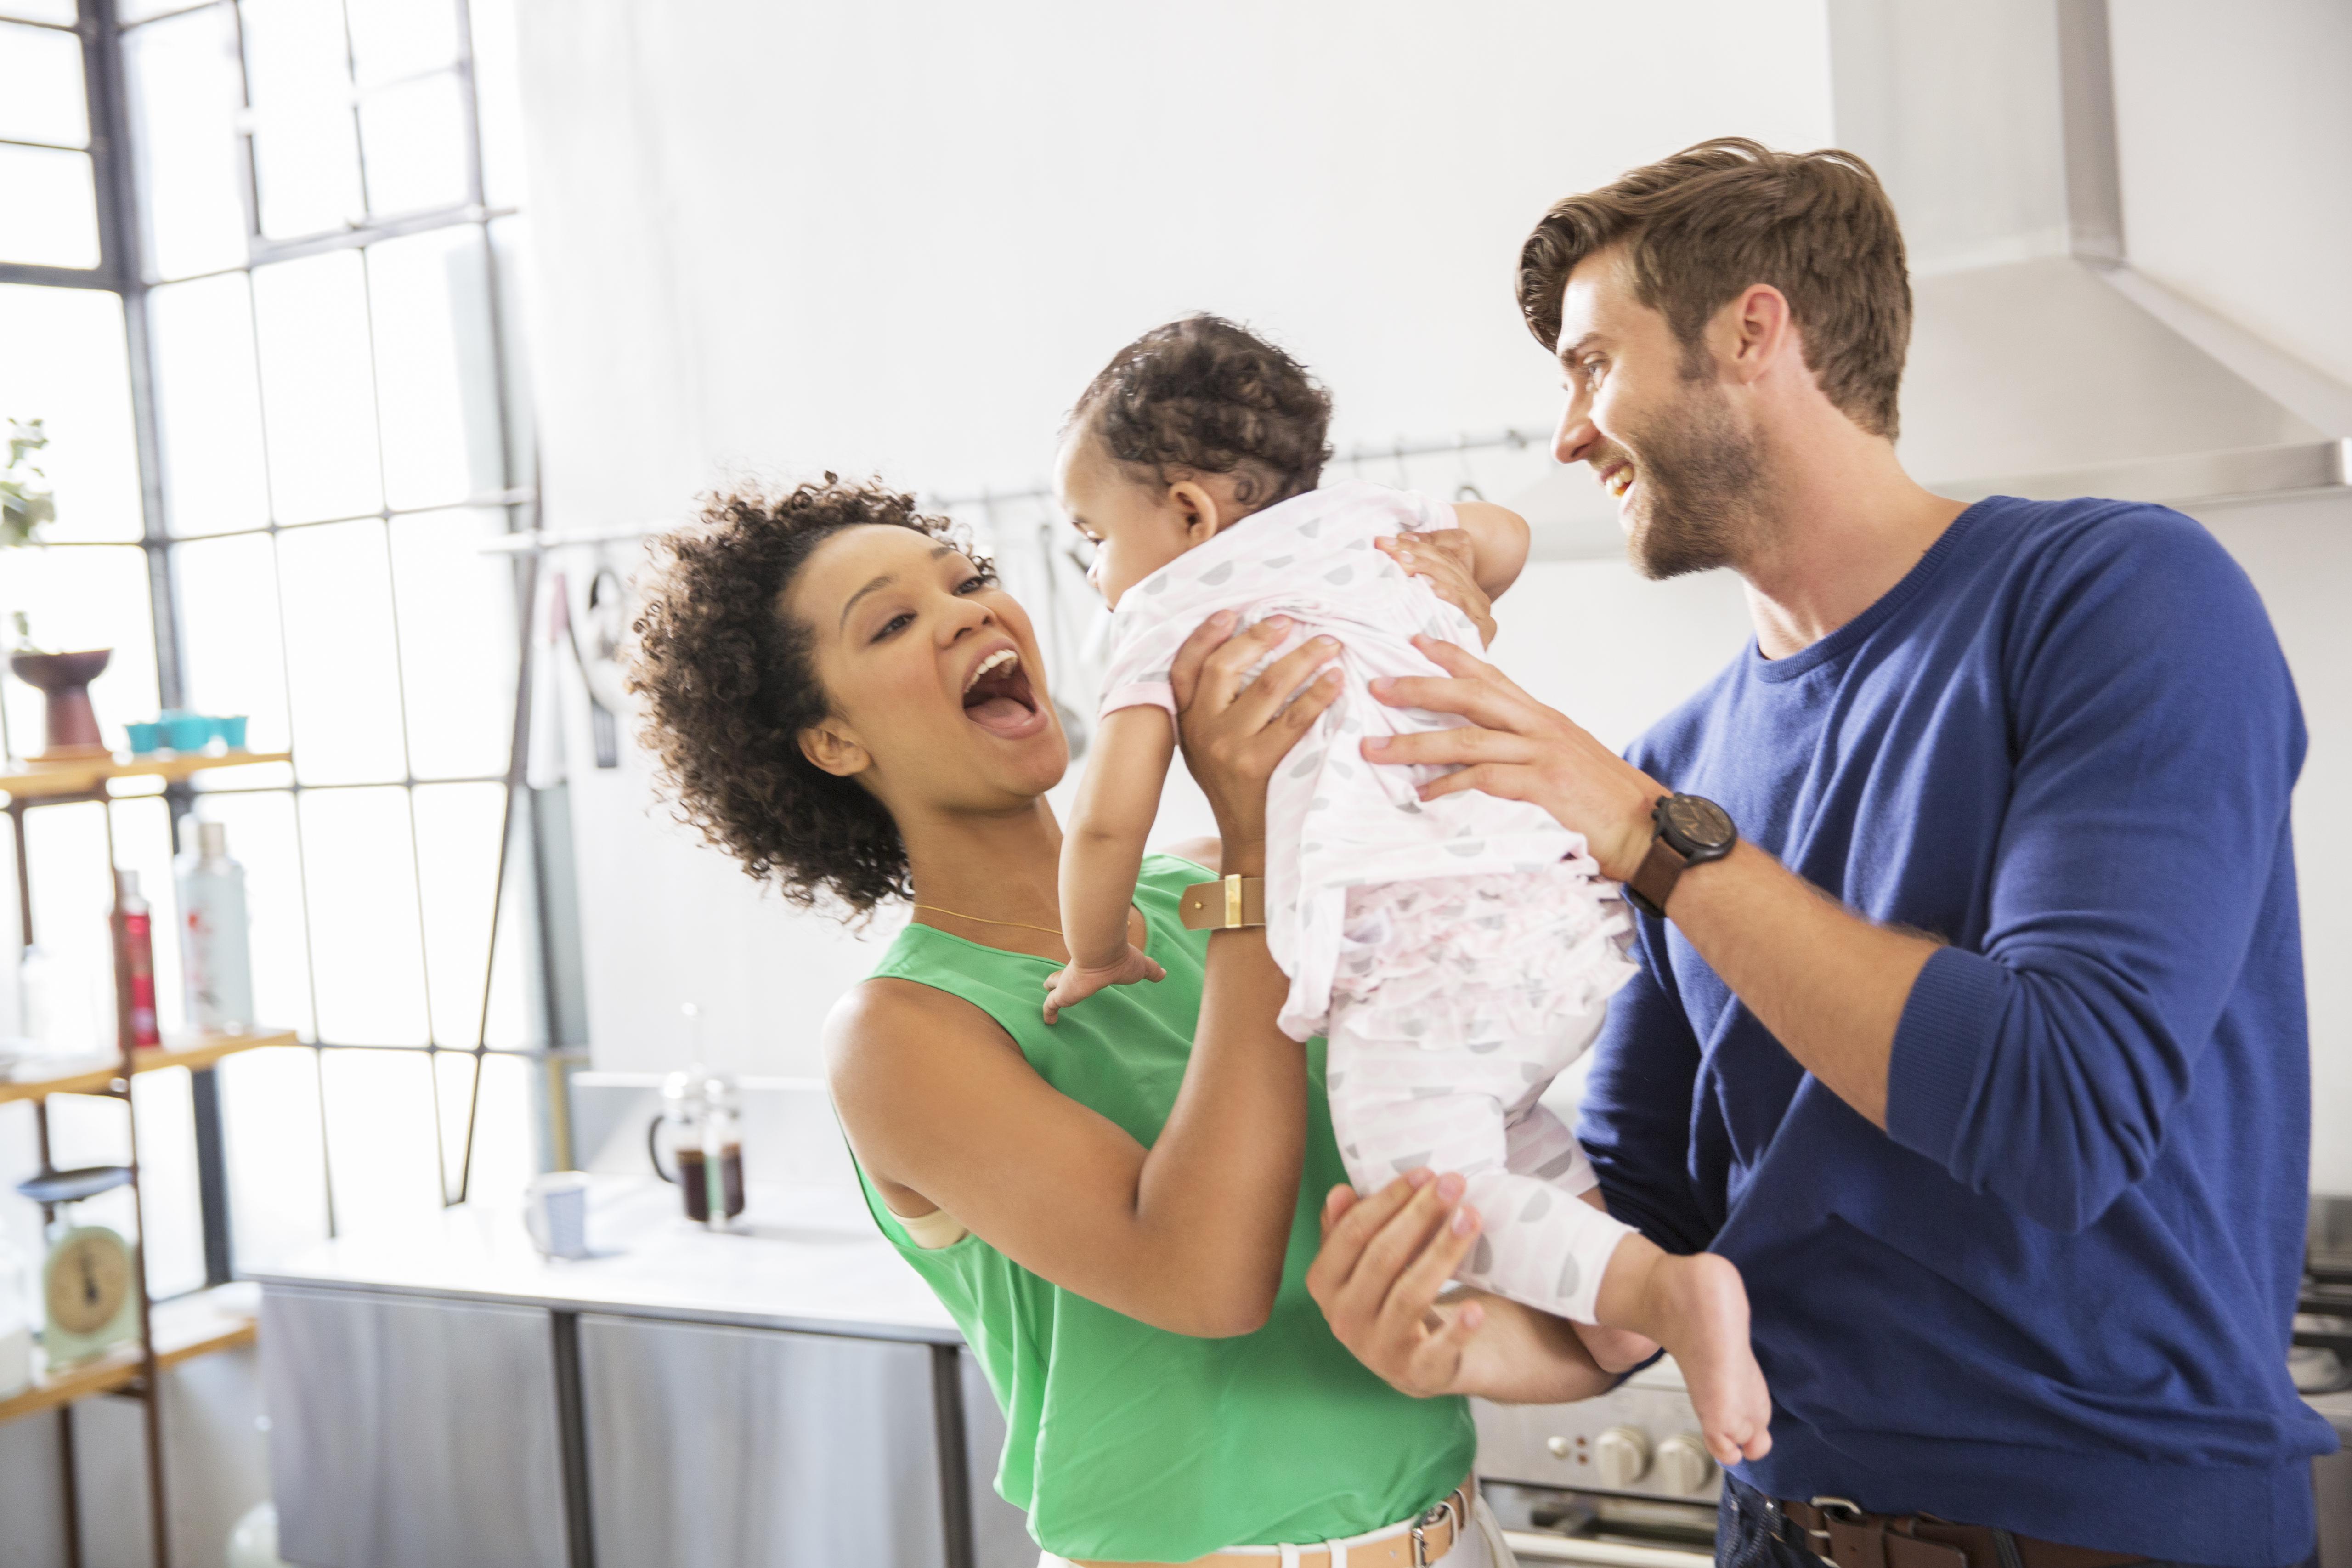 12 reasons having kids totally rocks